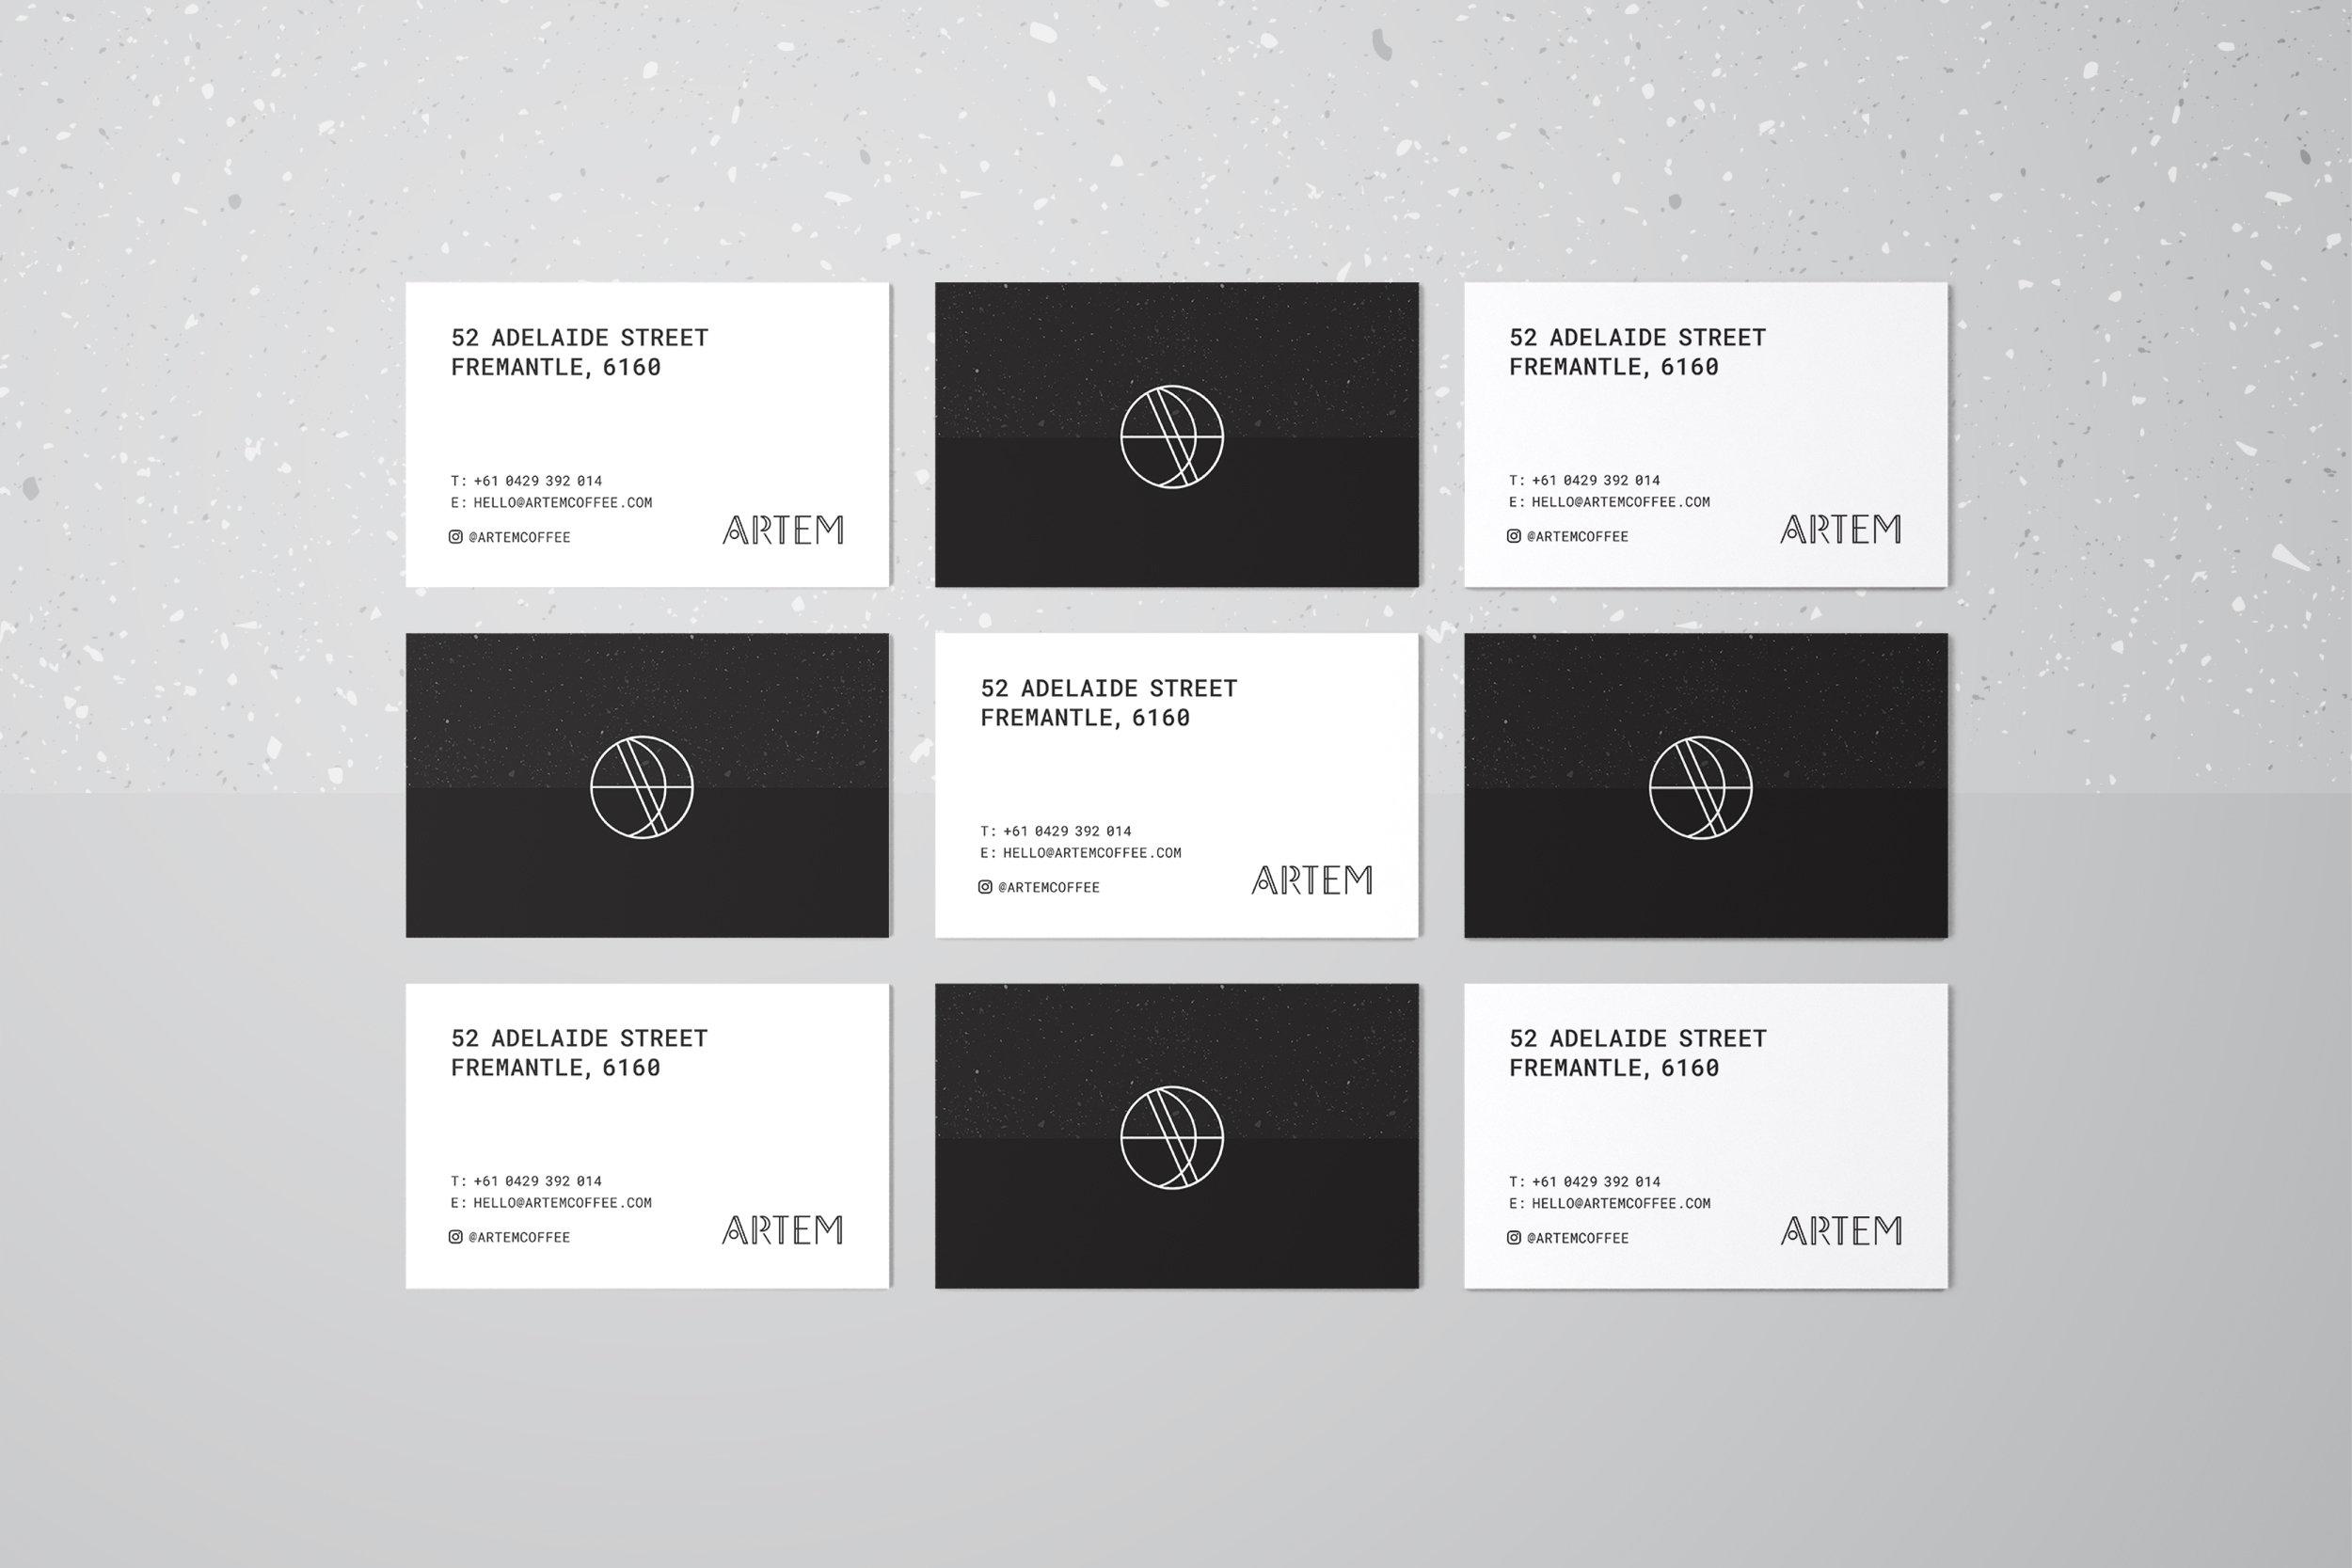 Artem Website Graphics 2500 x 1667px3.jpg